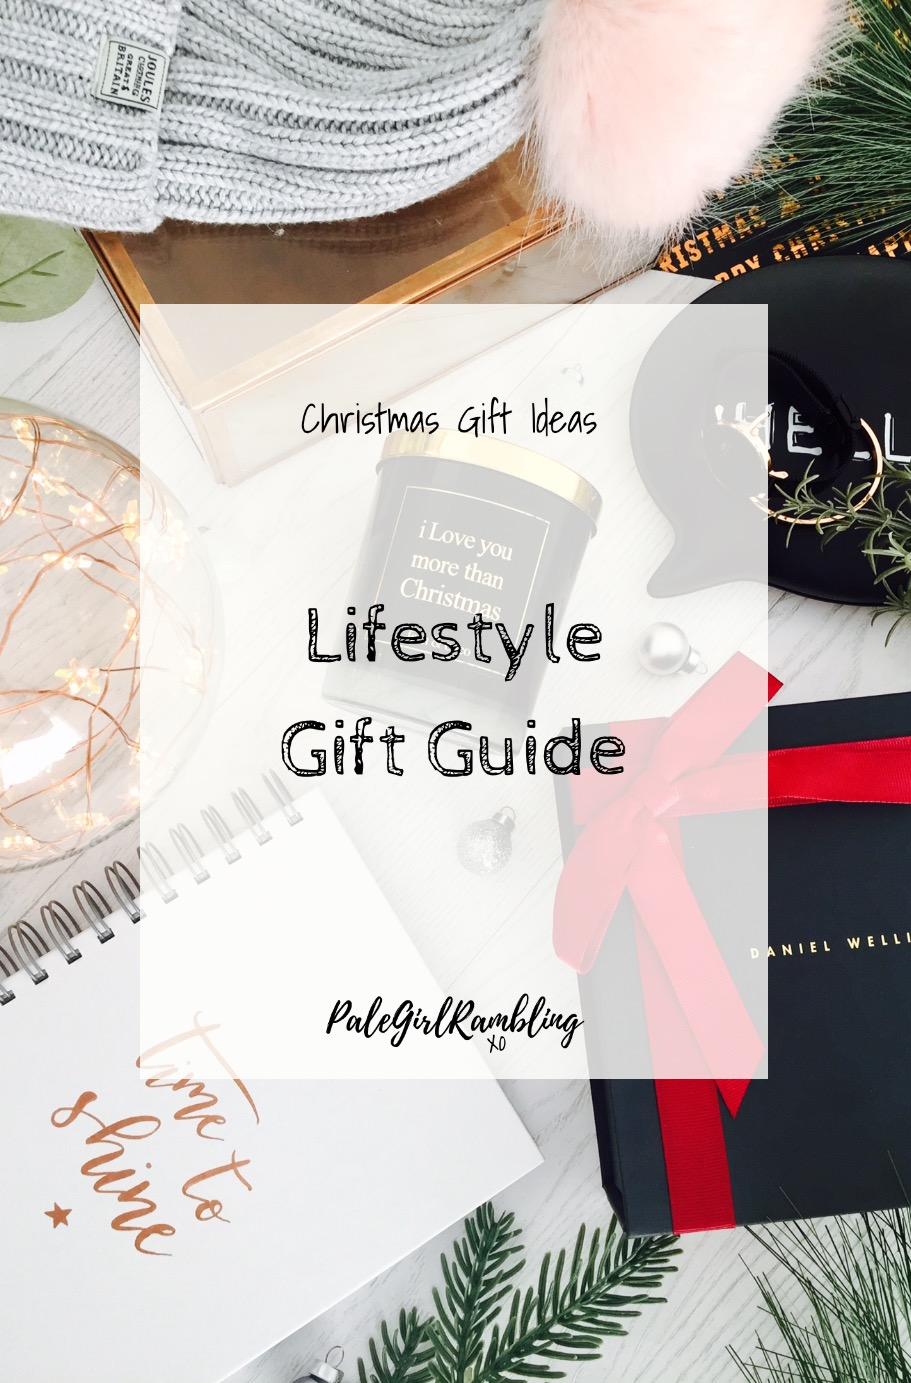 Lifestyle Gift Guide Joules Amara Jewellery pandora ring dressing table stationary Martha brook LoveGiveInk Daniel Wellington watch